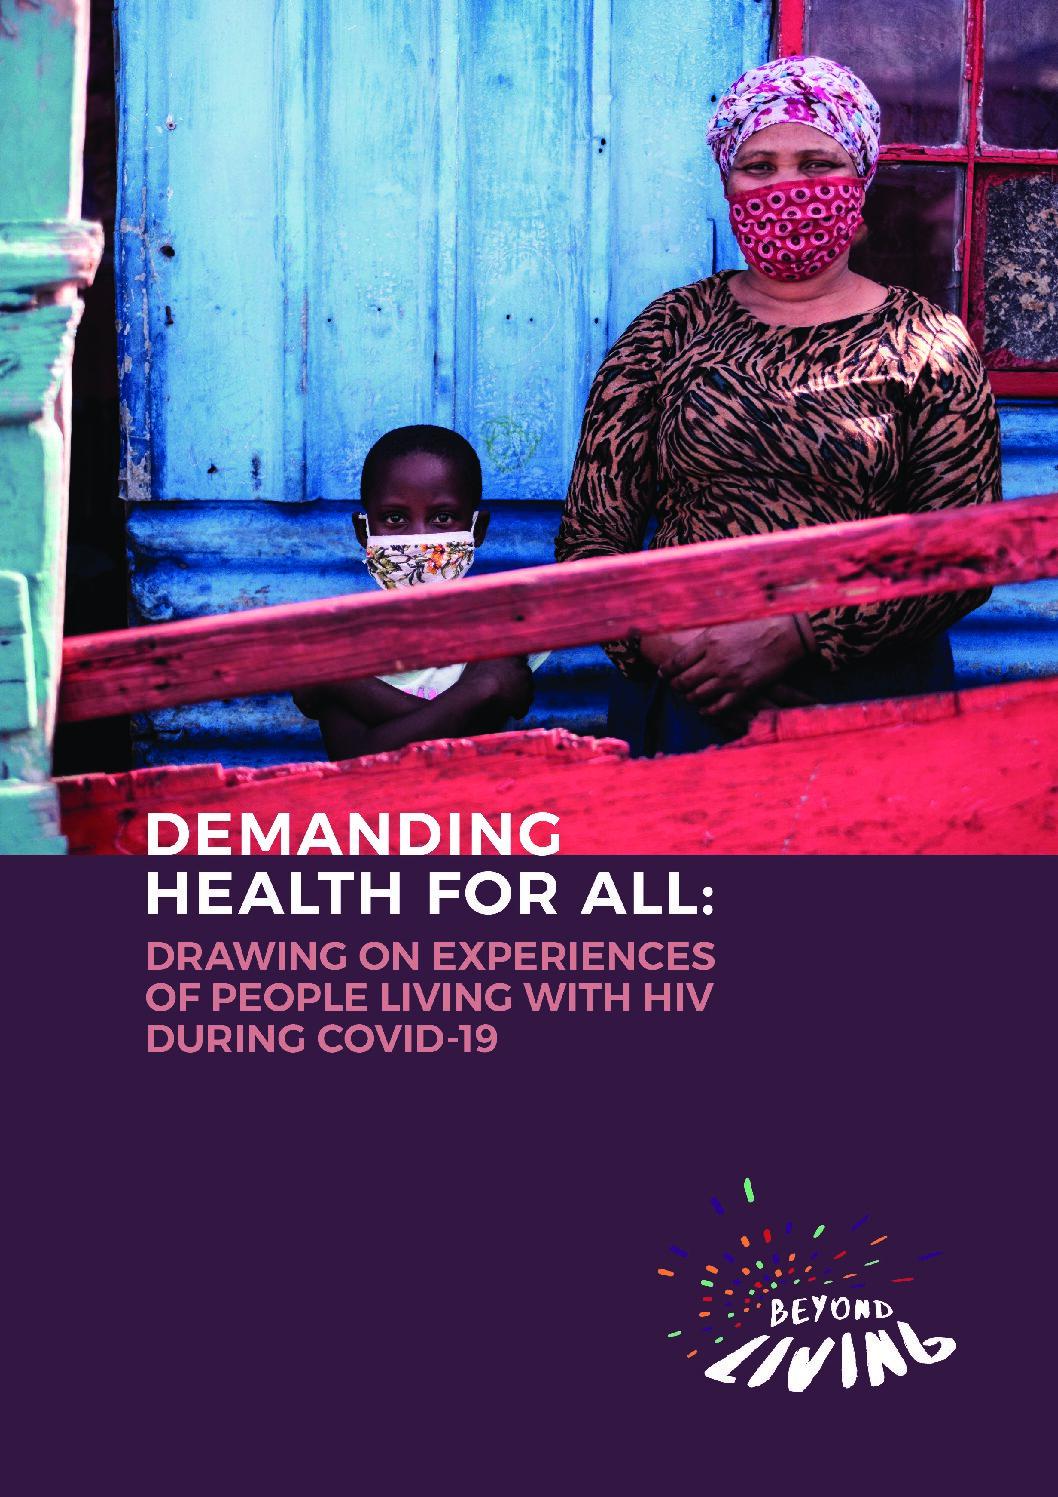 Demanding health for all